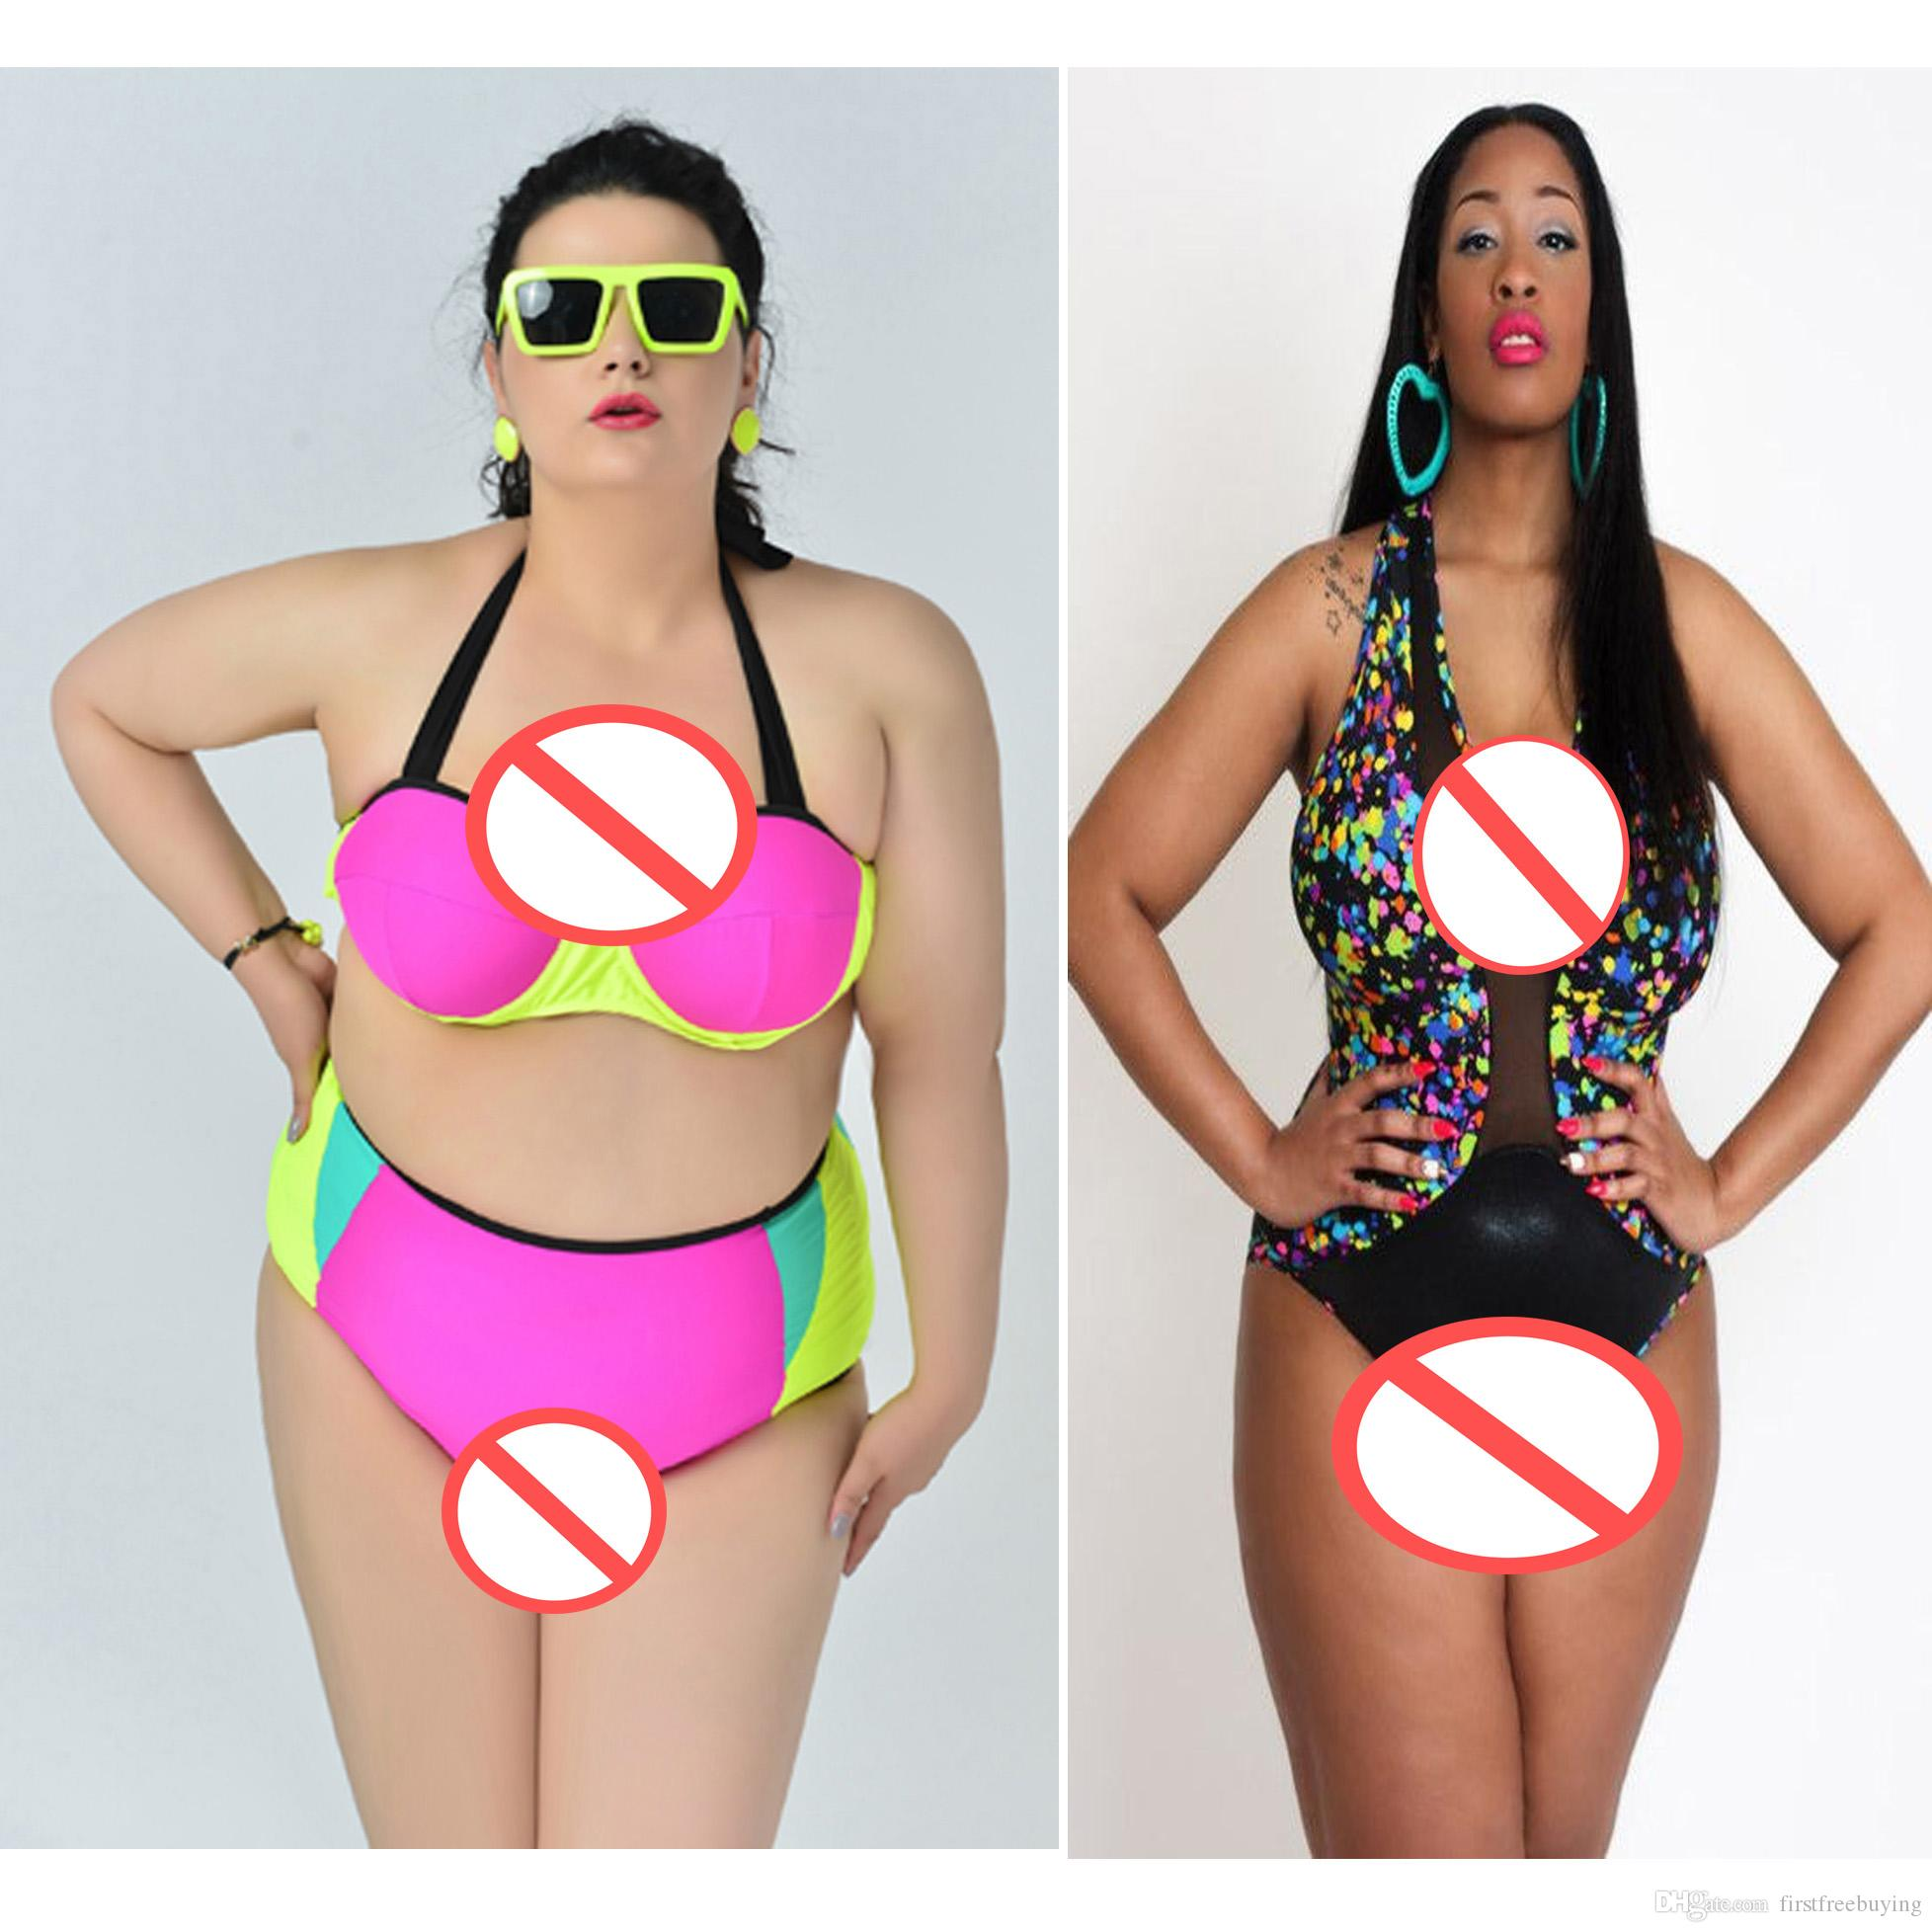 3cce139e7b Plus Size Swimwear Women One Piece Swimsuit Solid Swimwear Large Size  Vintage Retro Swimsuit Bathing Suits Plus Size Women Swimwear Plus Size  Swimsuit Sexy ...